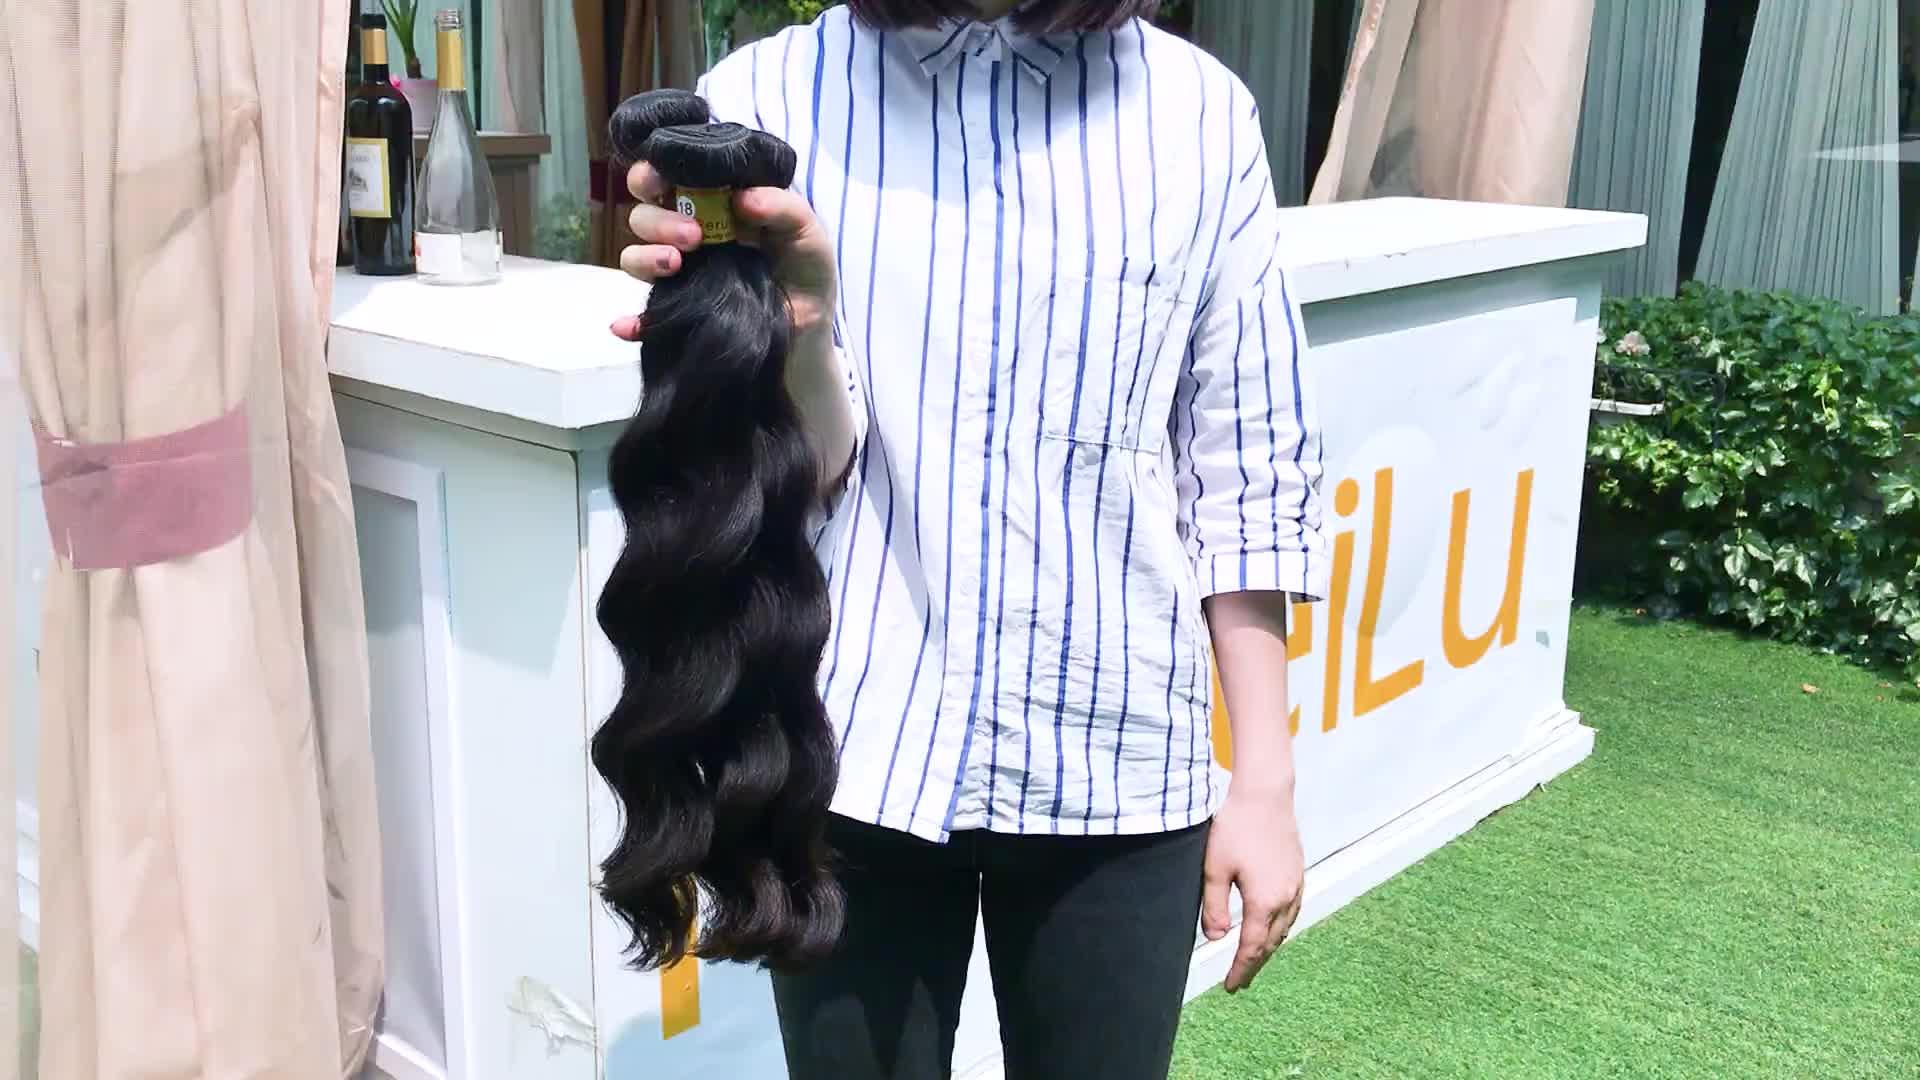 KBL short peruvian hair weave,virgin spiral curl human hair weaving,cheap short hair styles natural peruvian hair dubai market